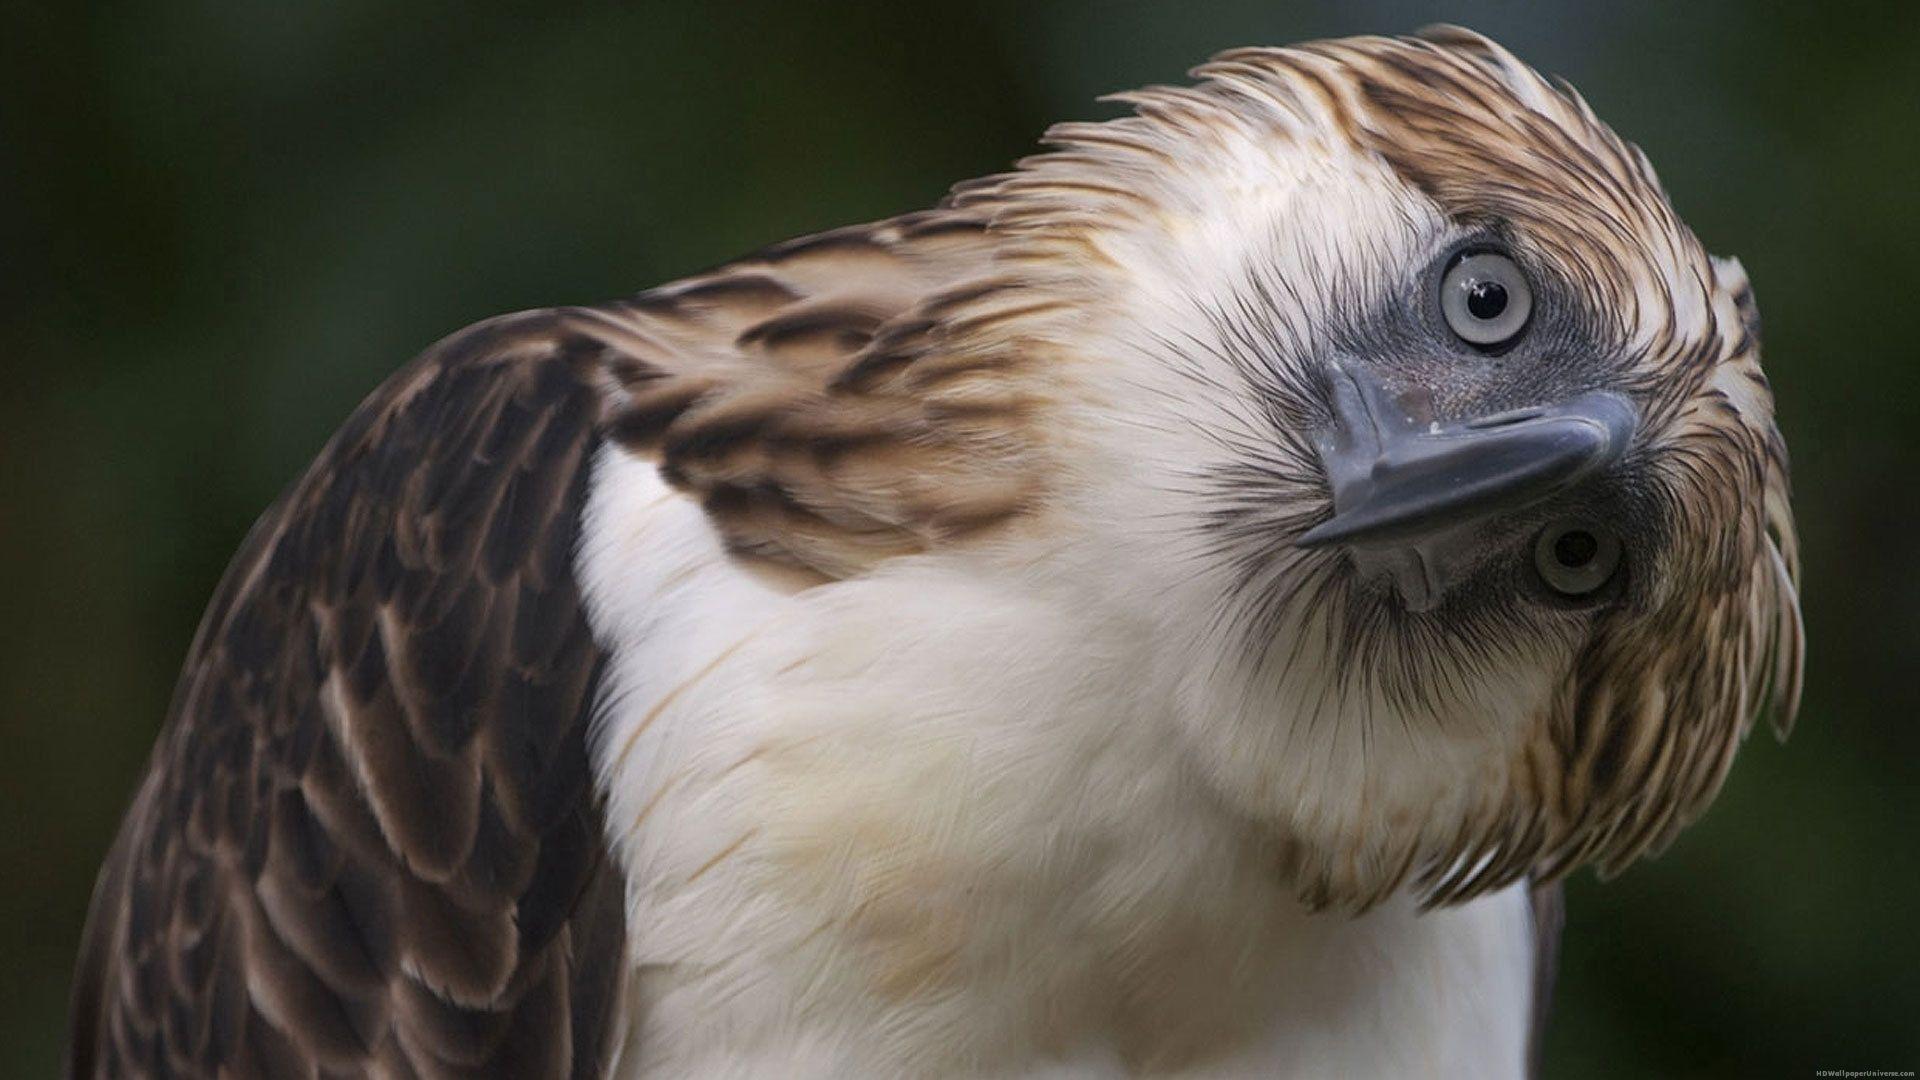 Bird Of Prey Hd Wallpaper Desktop Background Free Wallpapers Philippine Eagle Pet Birds Animals